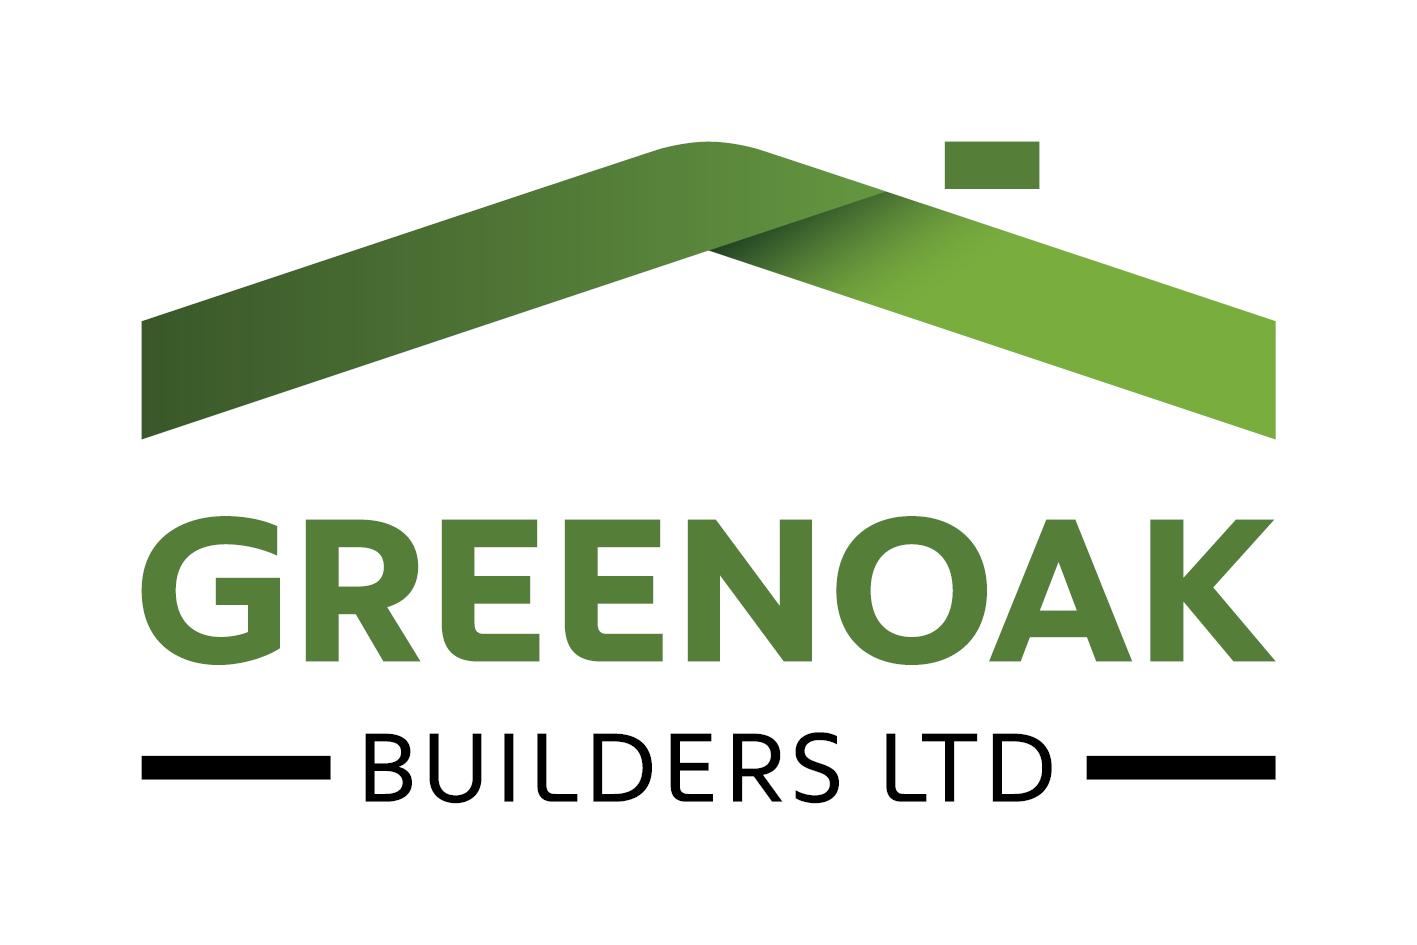 Greenoak Builders Ltd